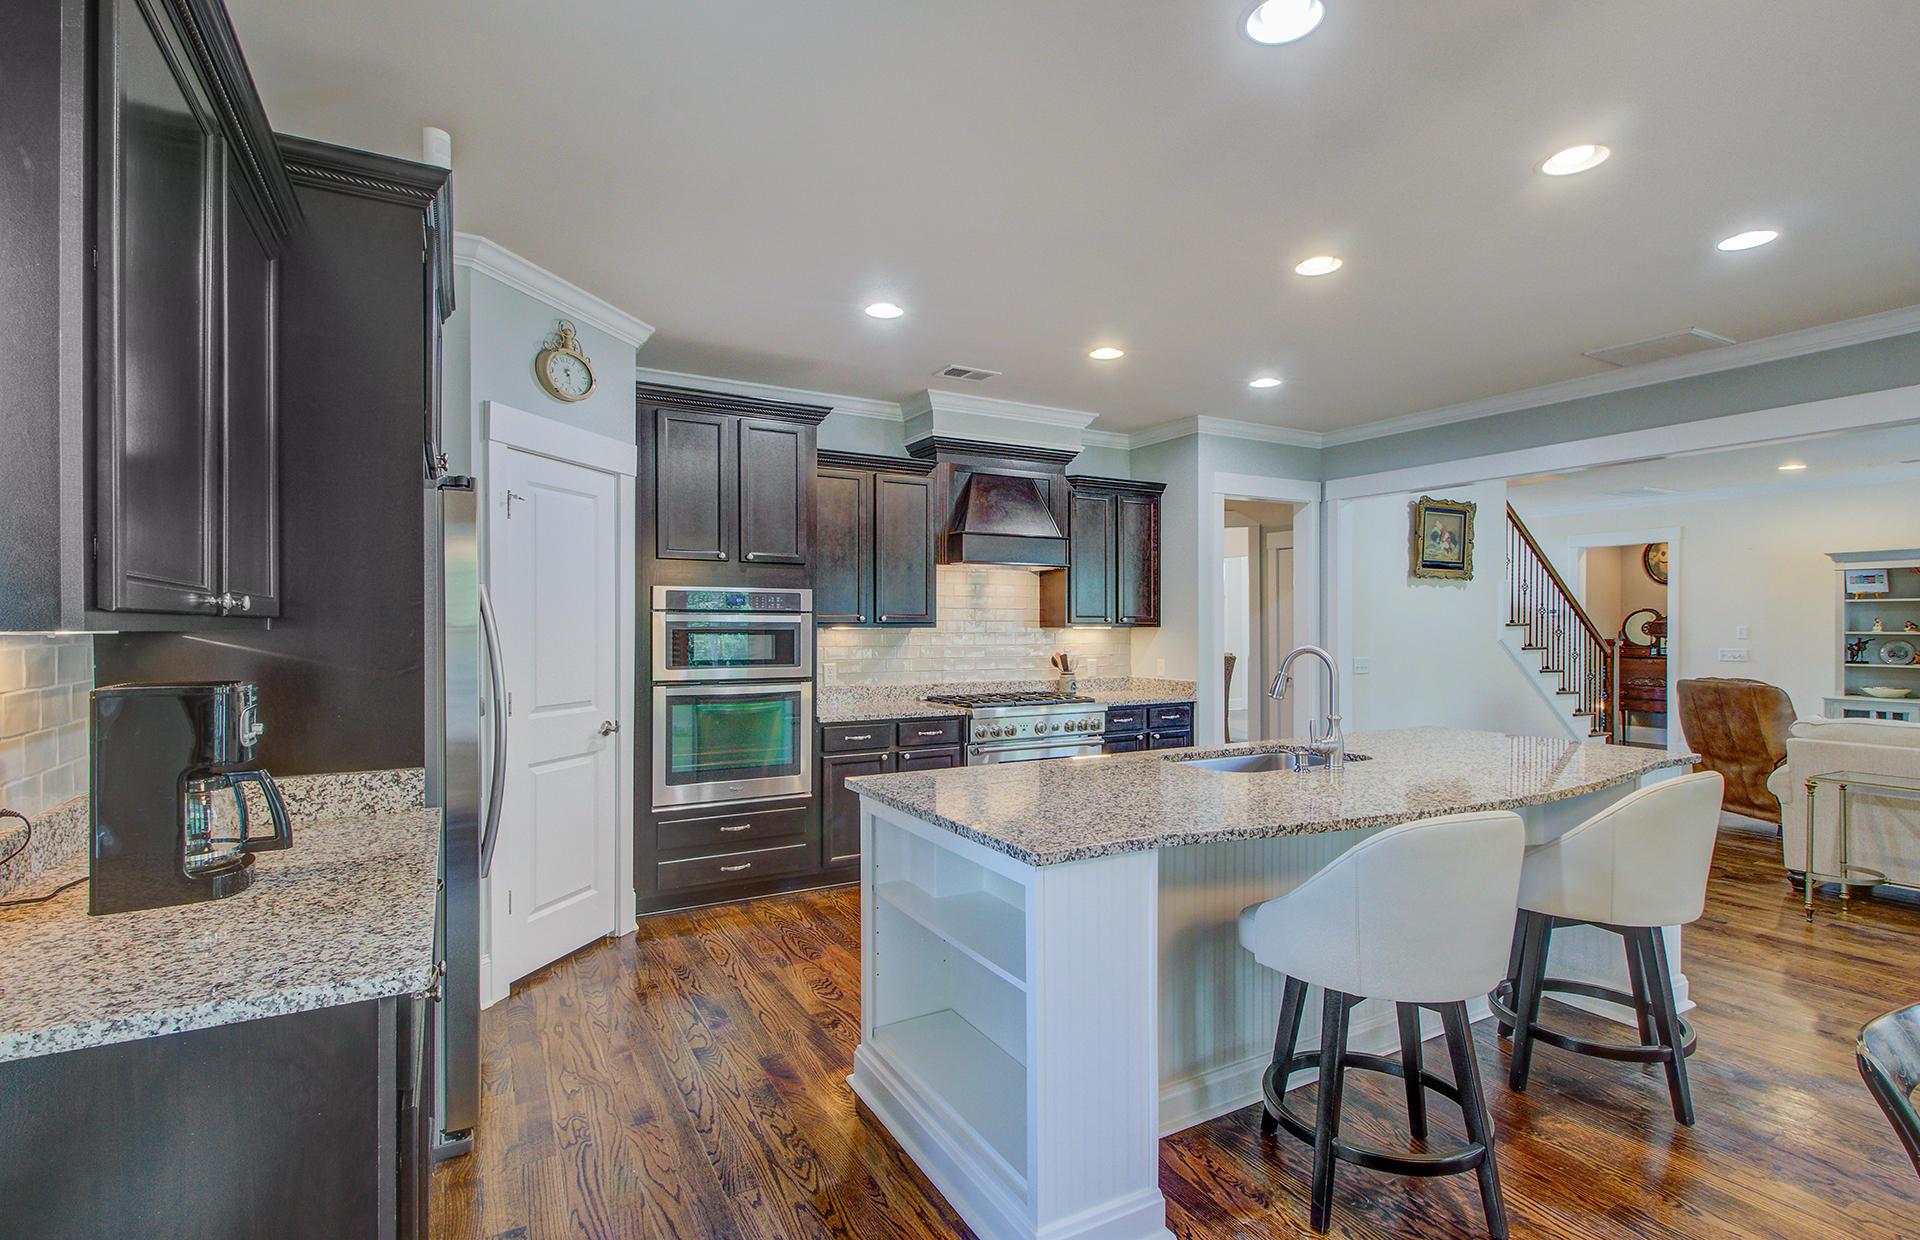 Scotts Creek Homes For Sale - 1404 Scotts Creek, Mount Pleasant, SC - 29